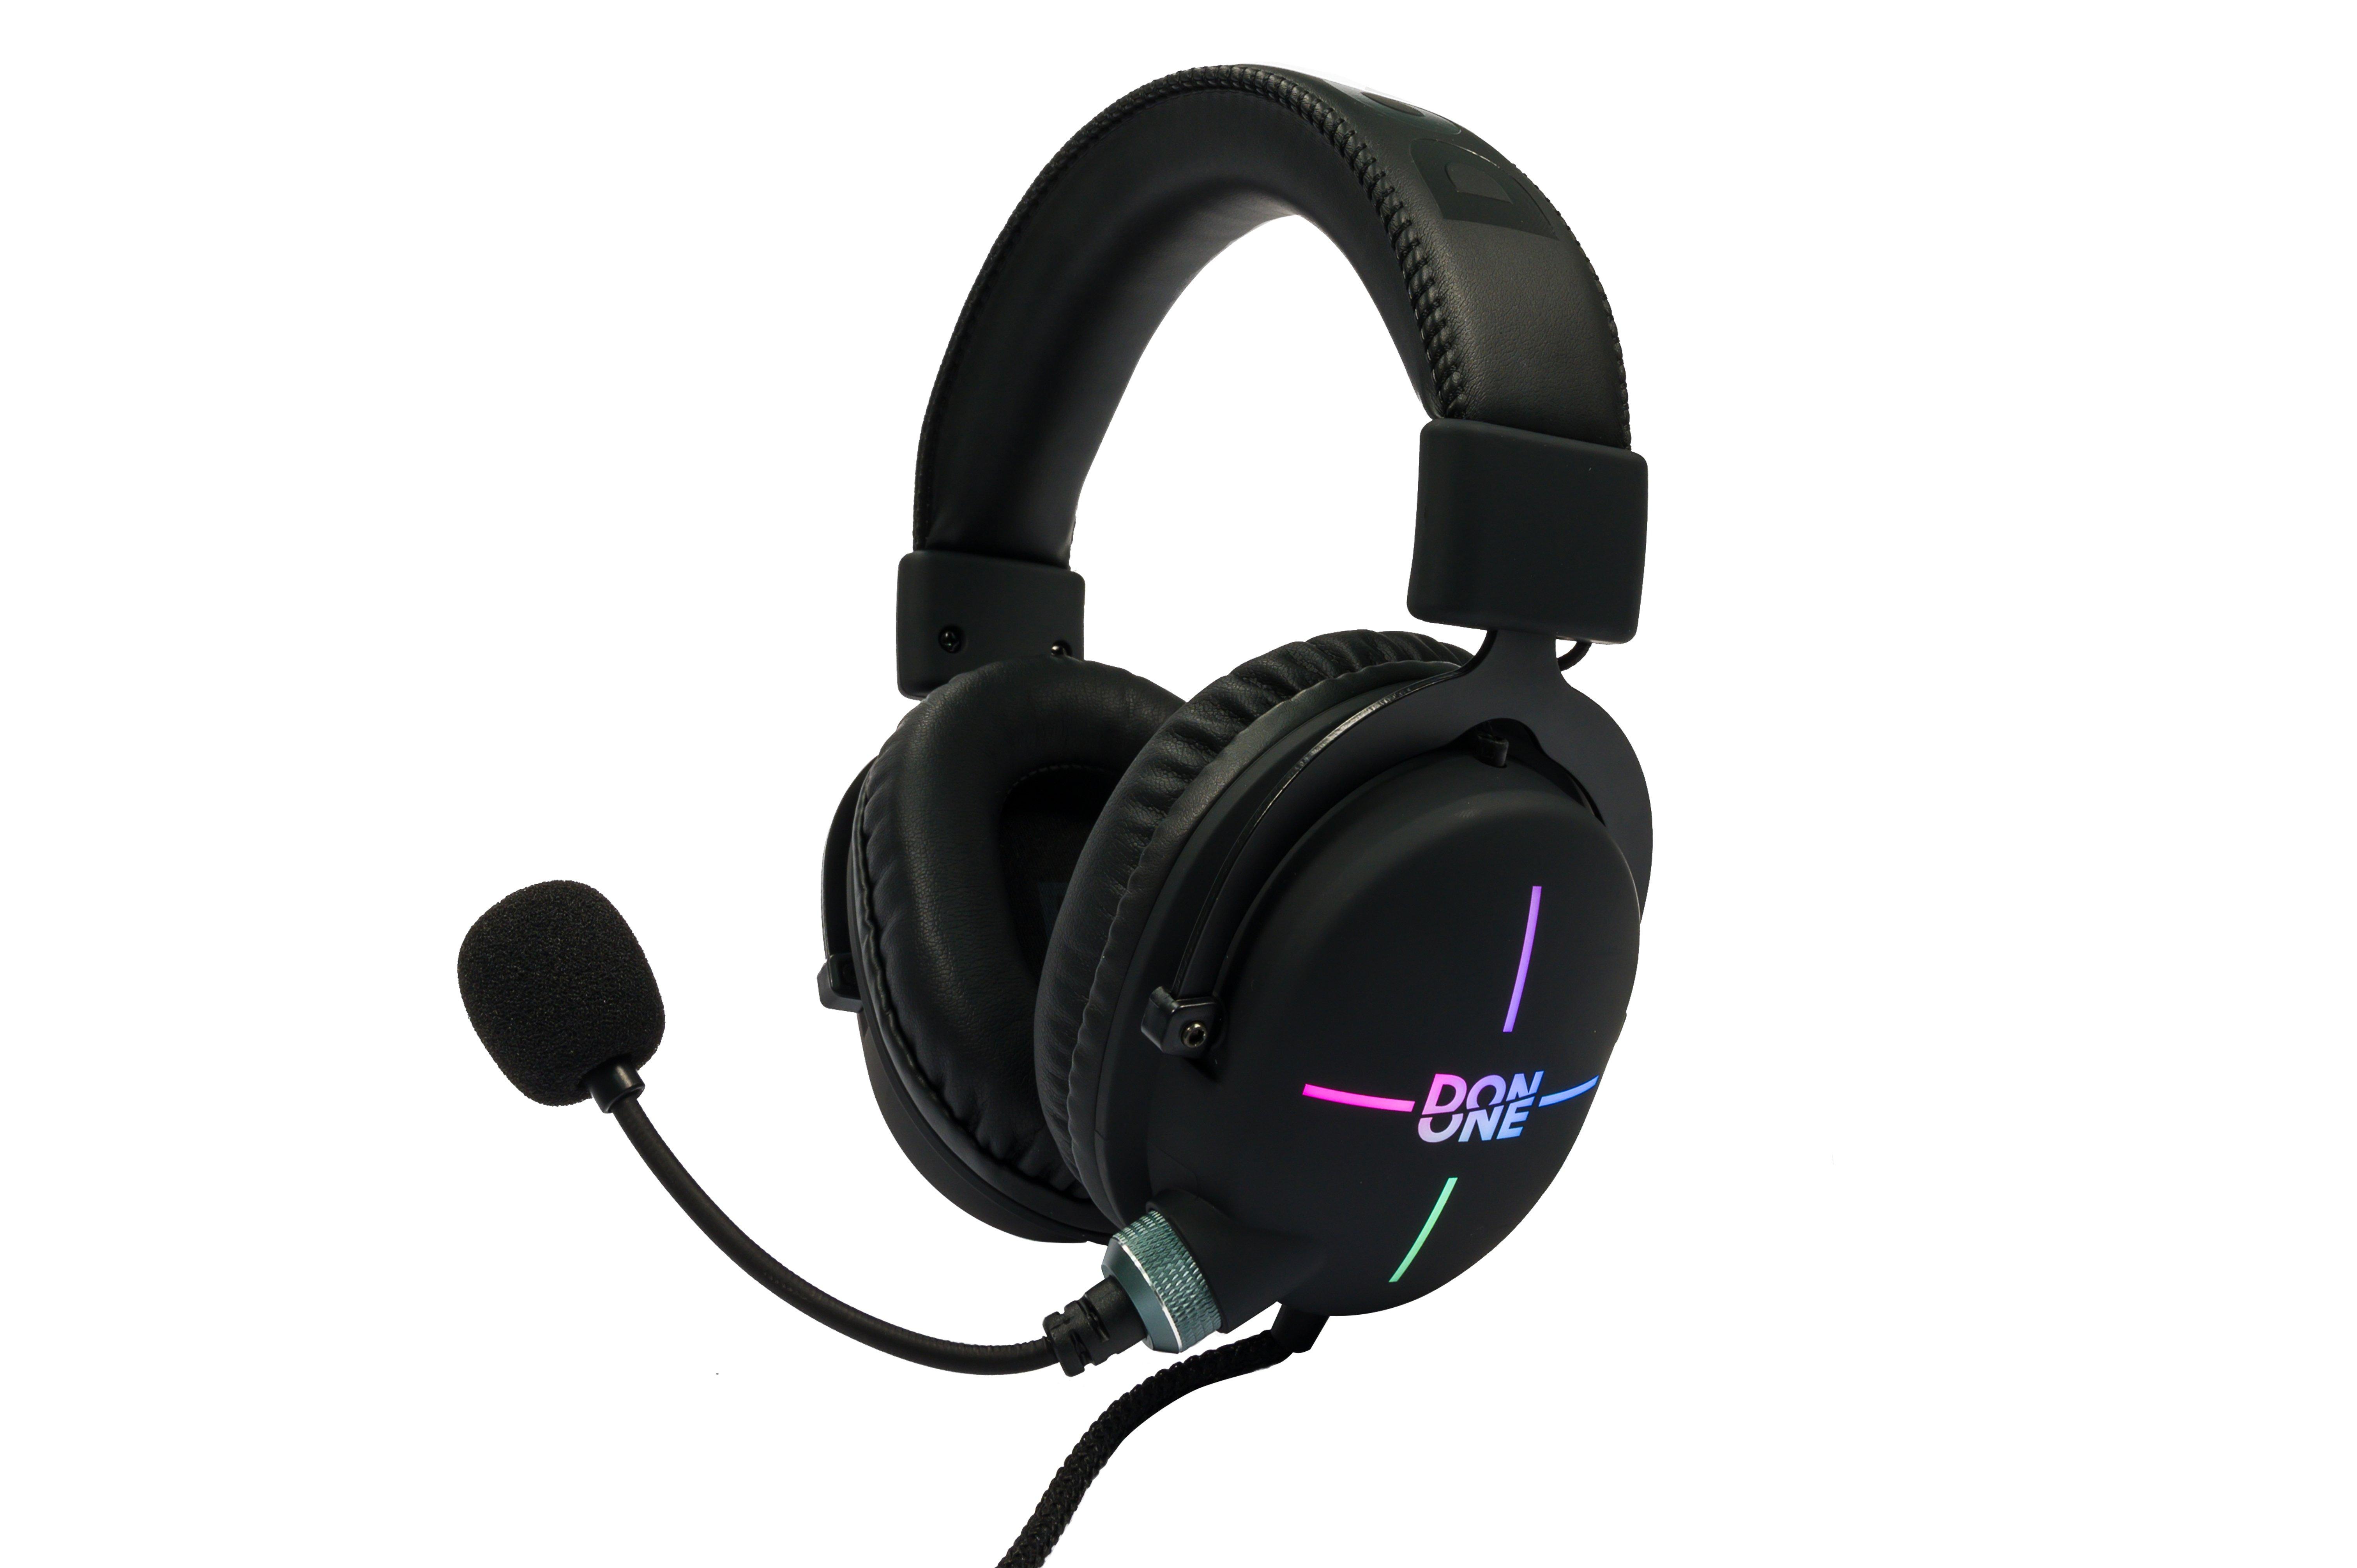 DON ONE - GH300 MK2 RGB Gaming Headset